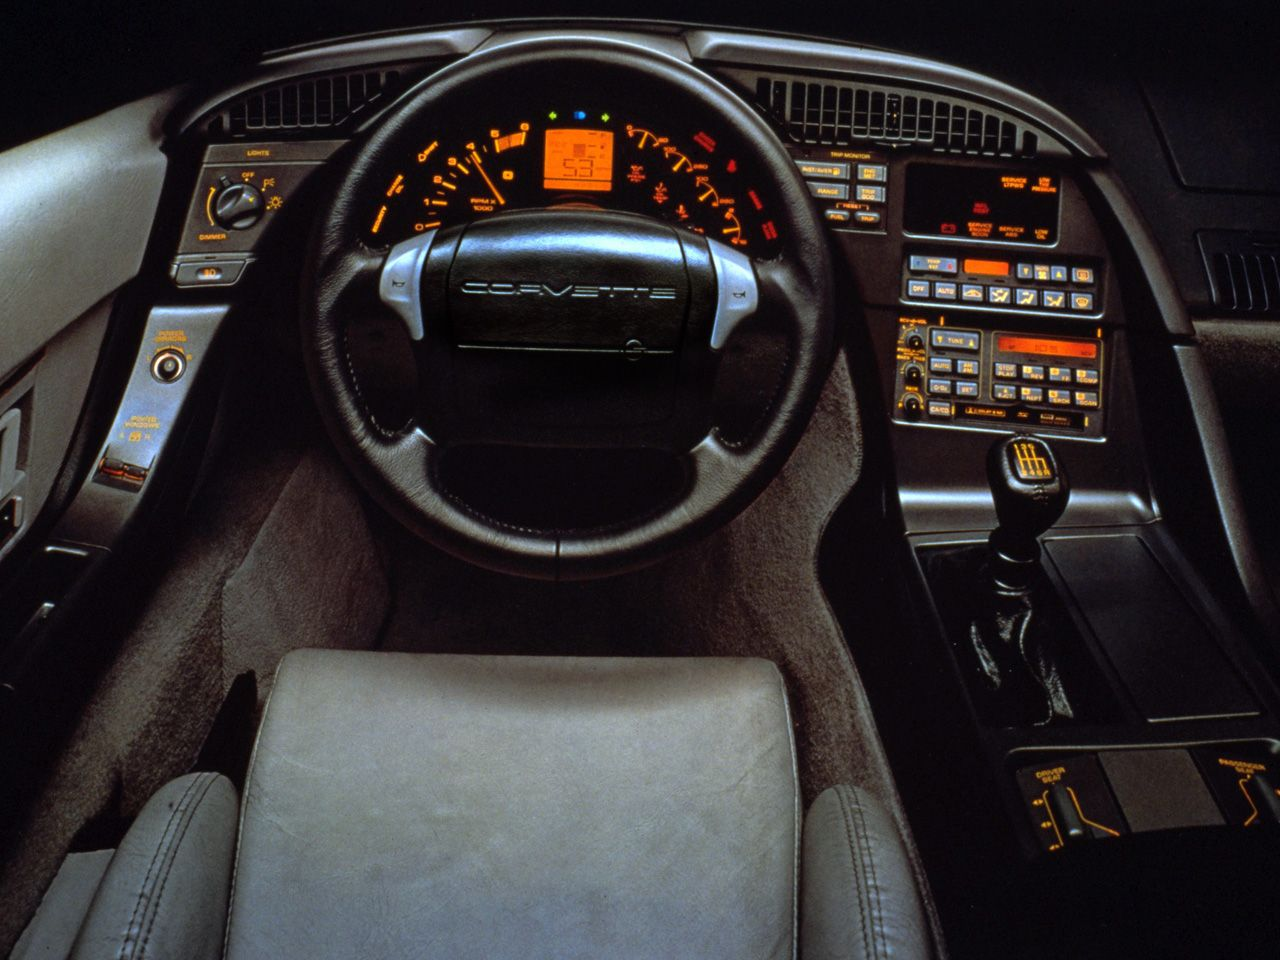 medium resolution of 1995 corvette interior chevrolet corvette c4 manual transmission super sport buick cadillac